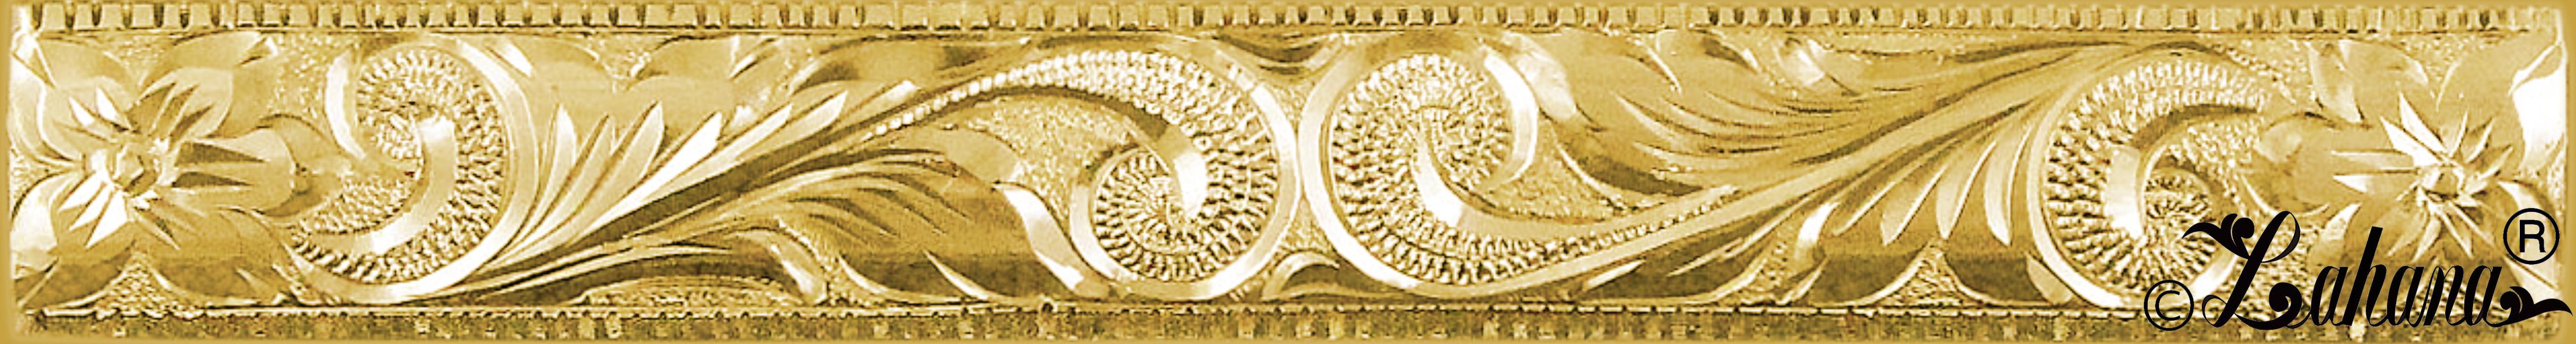 sample-logo-14k-td-a.jpg